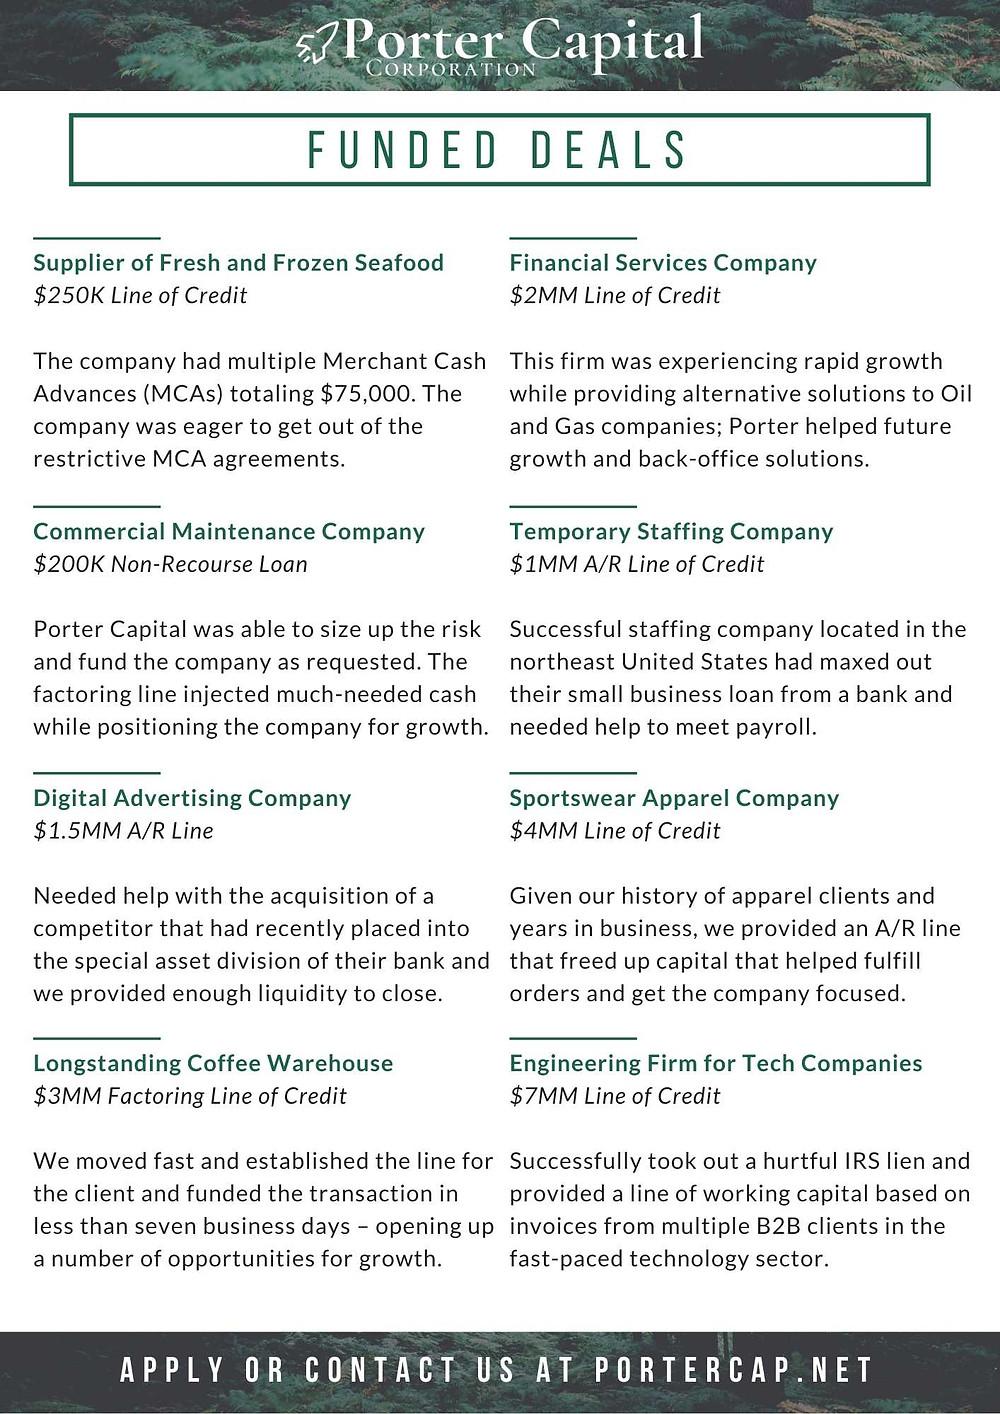 porter capital invoice factoring deals 2019 flyer